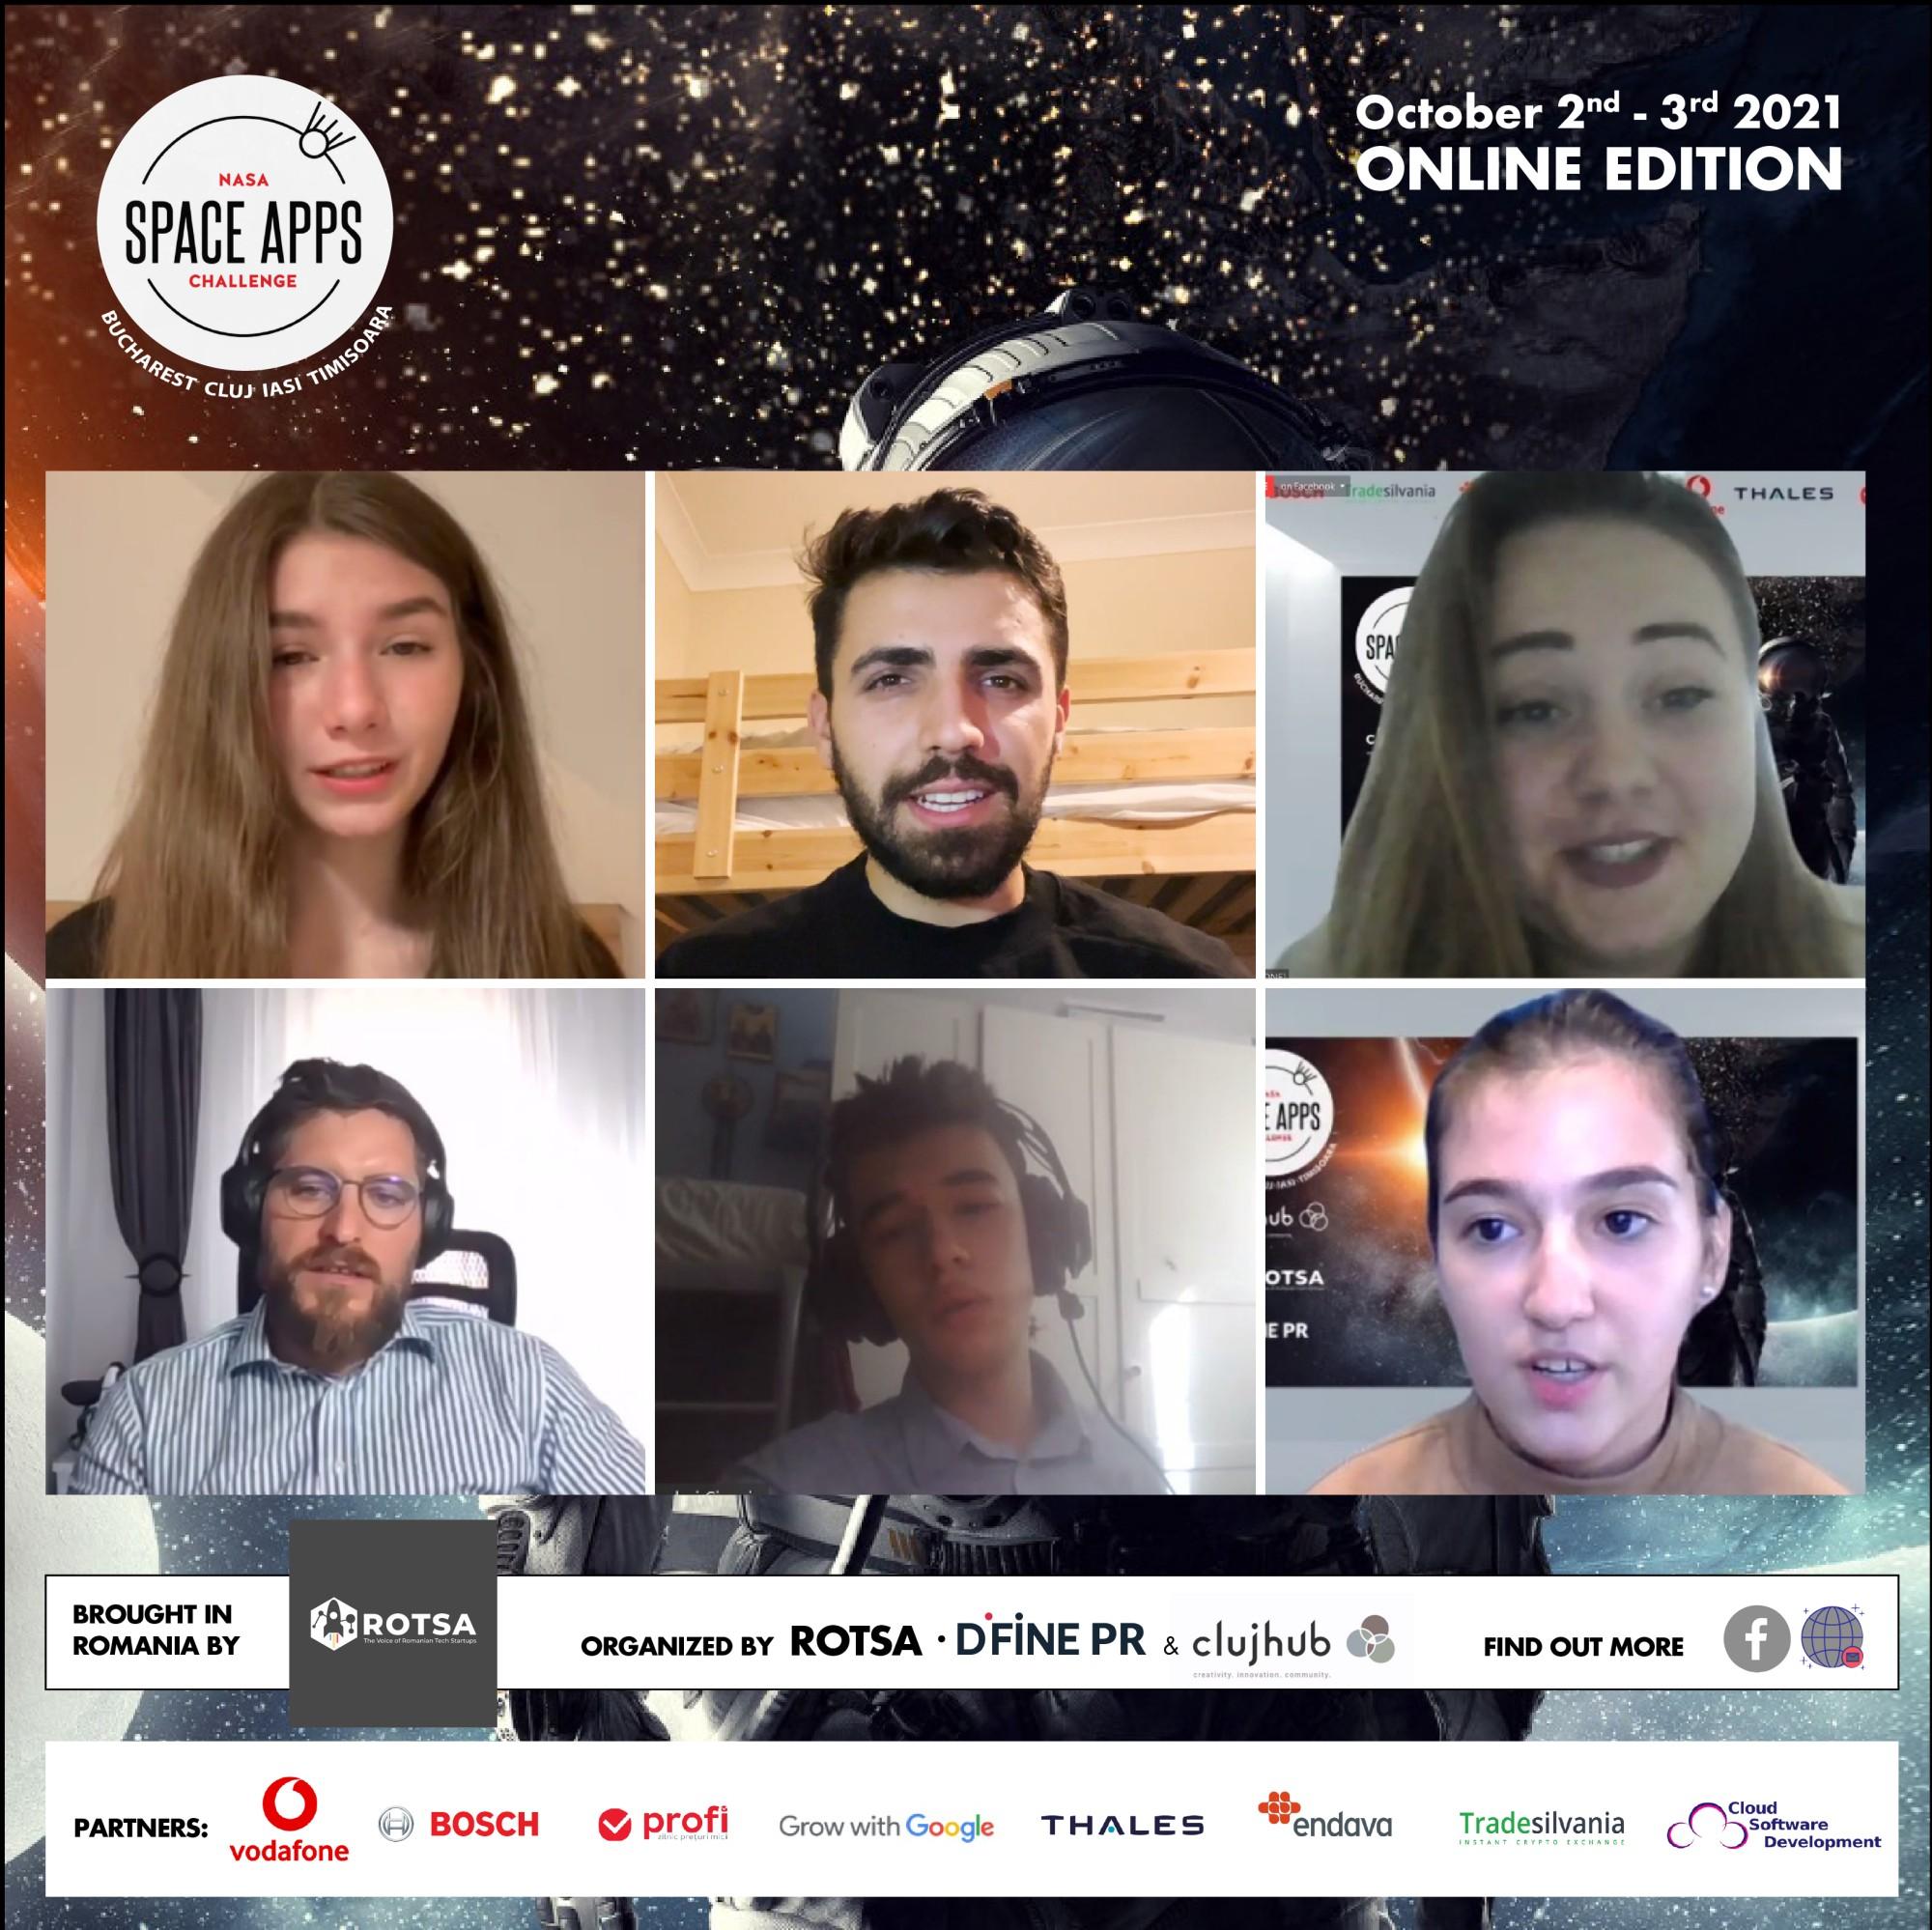 câștigătorii NASA Space Apps Challenge 2021